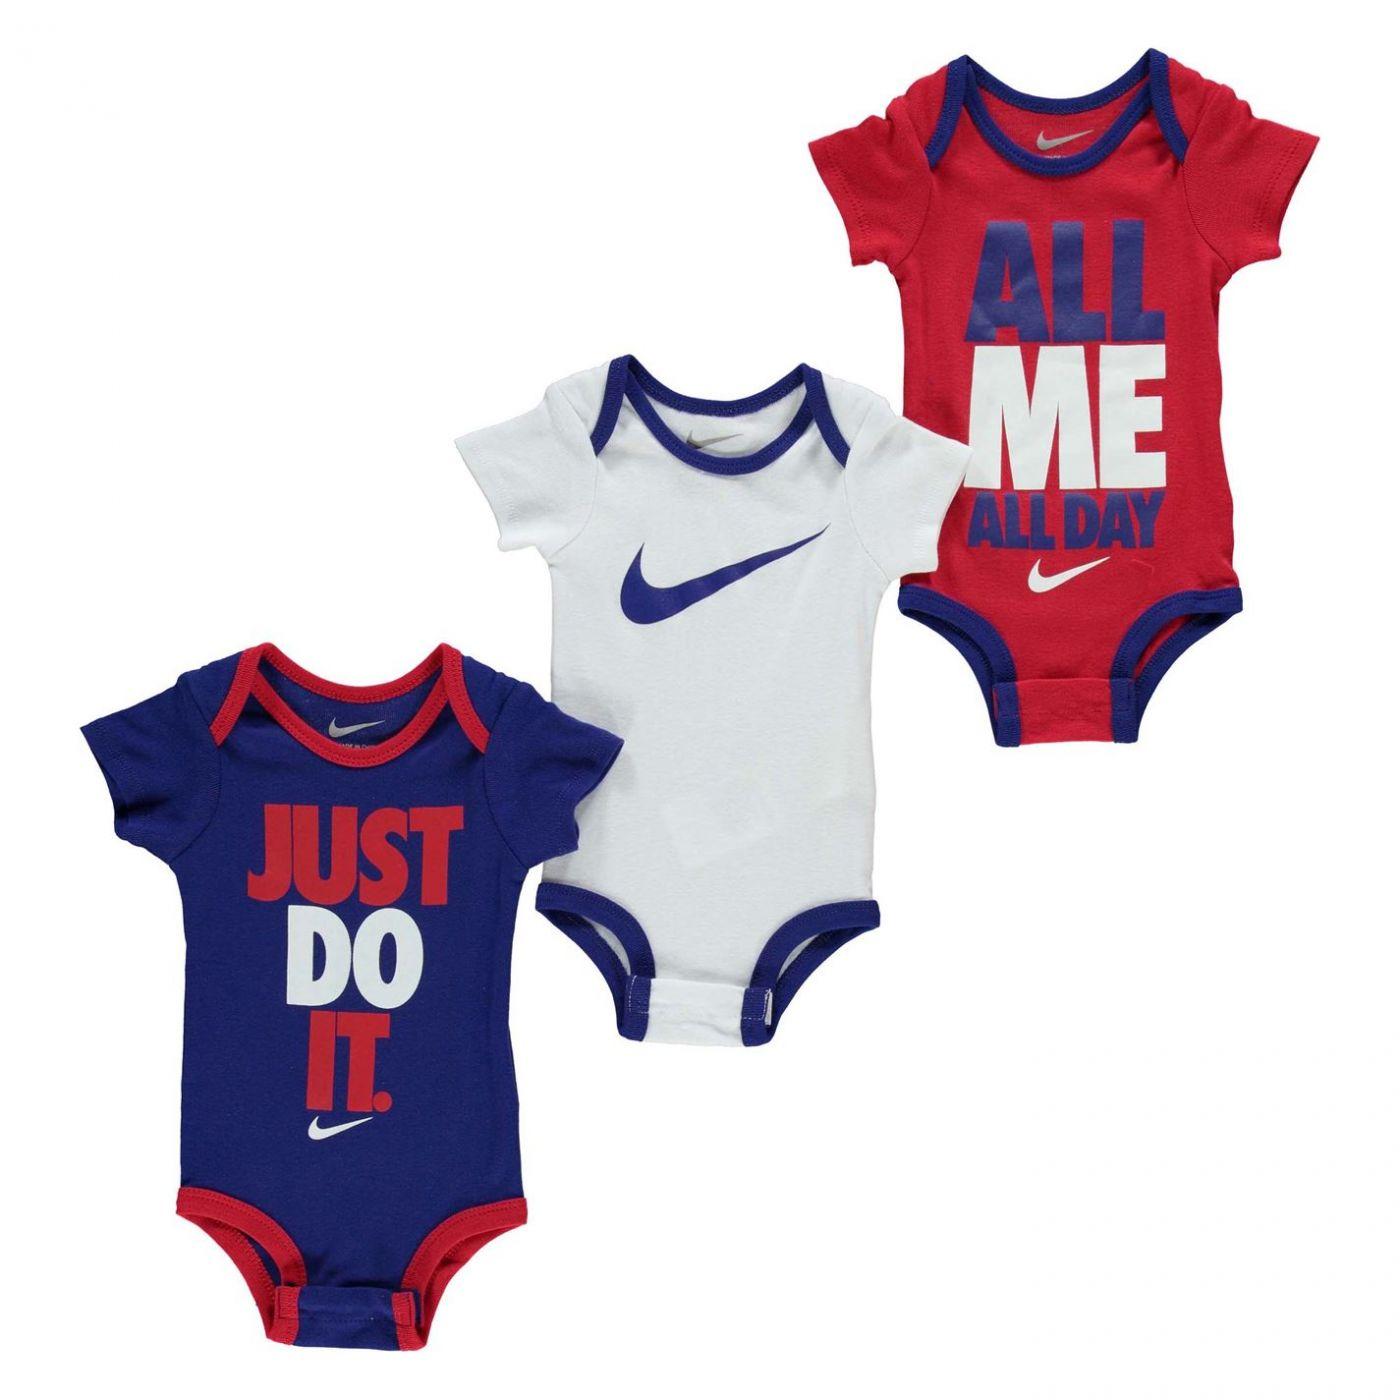 Nike Swoosh 3 Pack Romper Baby Girls